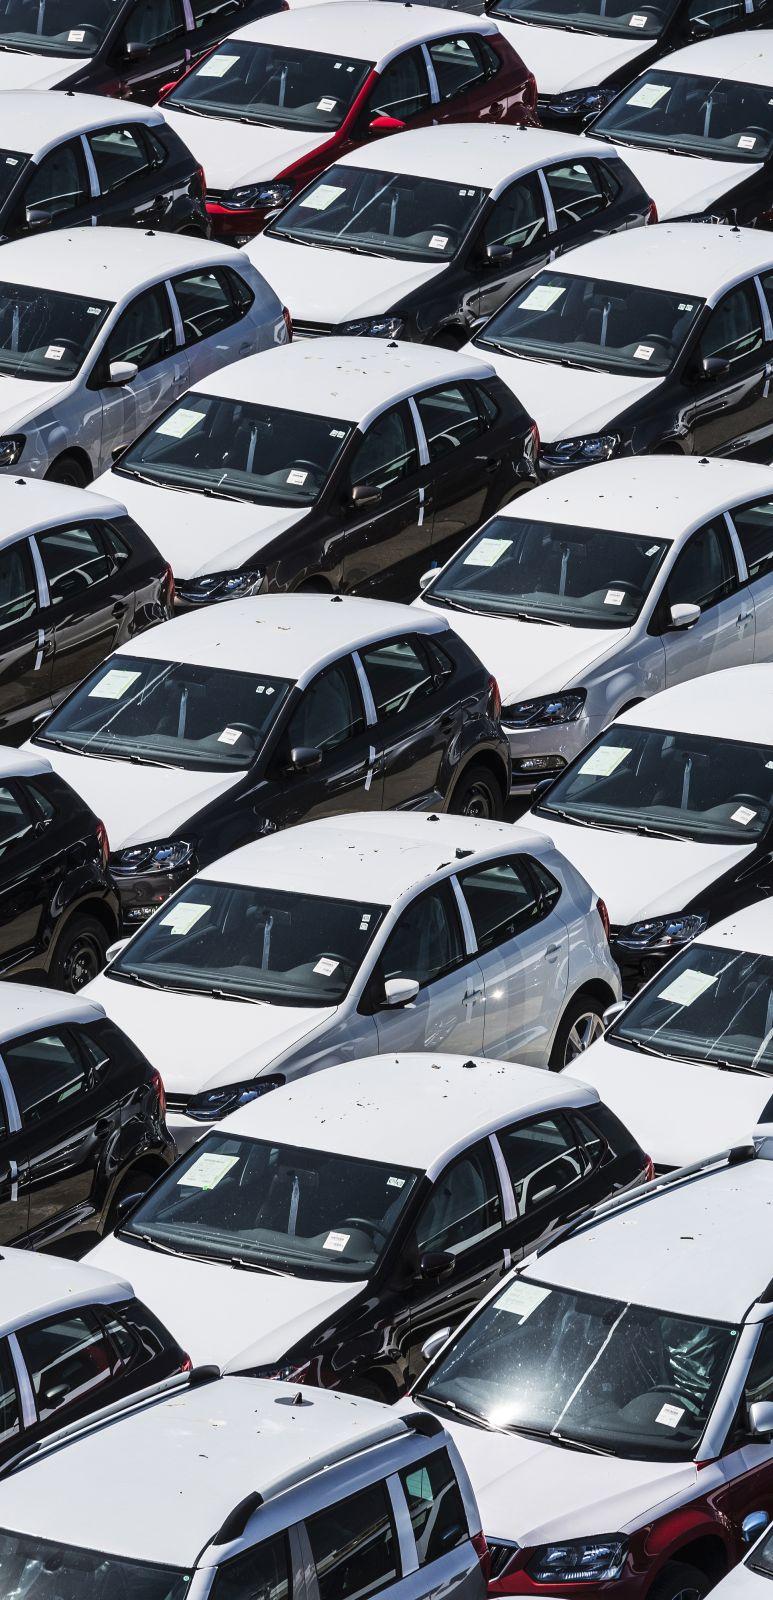 depositphotos_141134002-stock-photo-new-cars-ready-to-ship